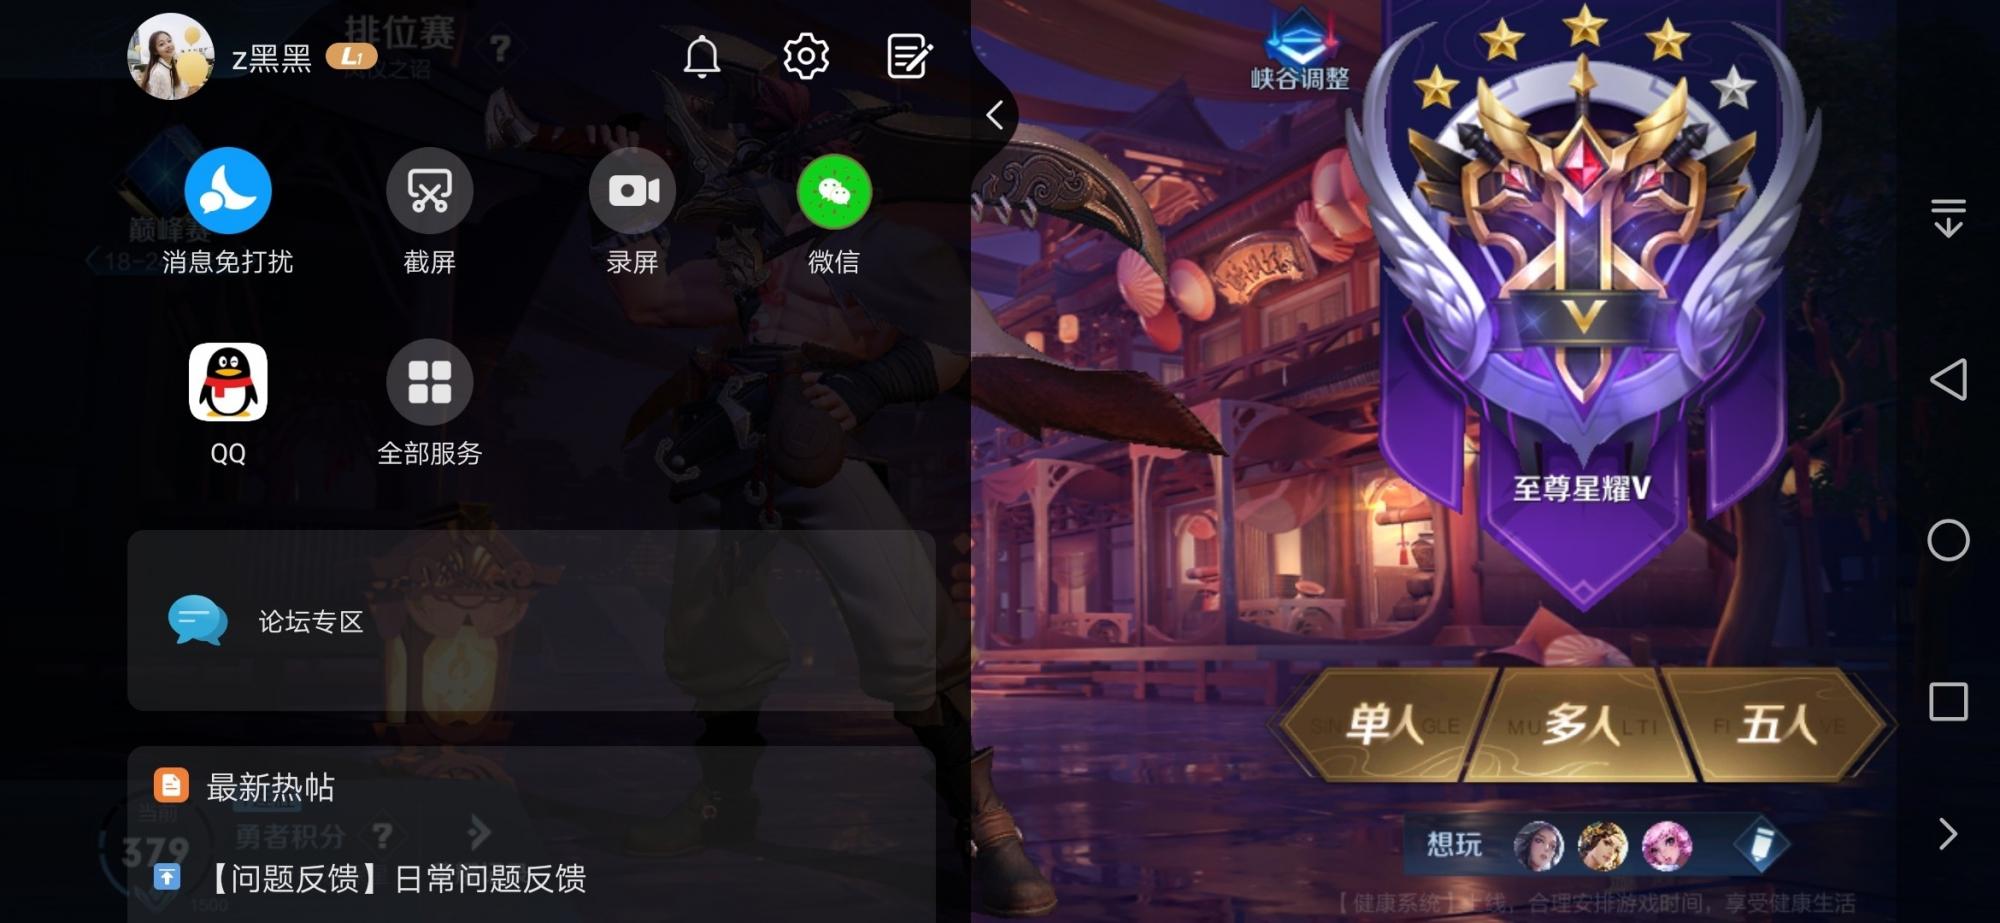 Screenshot_20191101_125233_com.tencent.tmgp.sgame.jpg